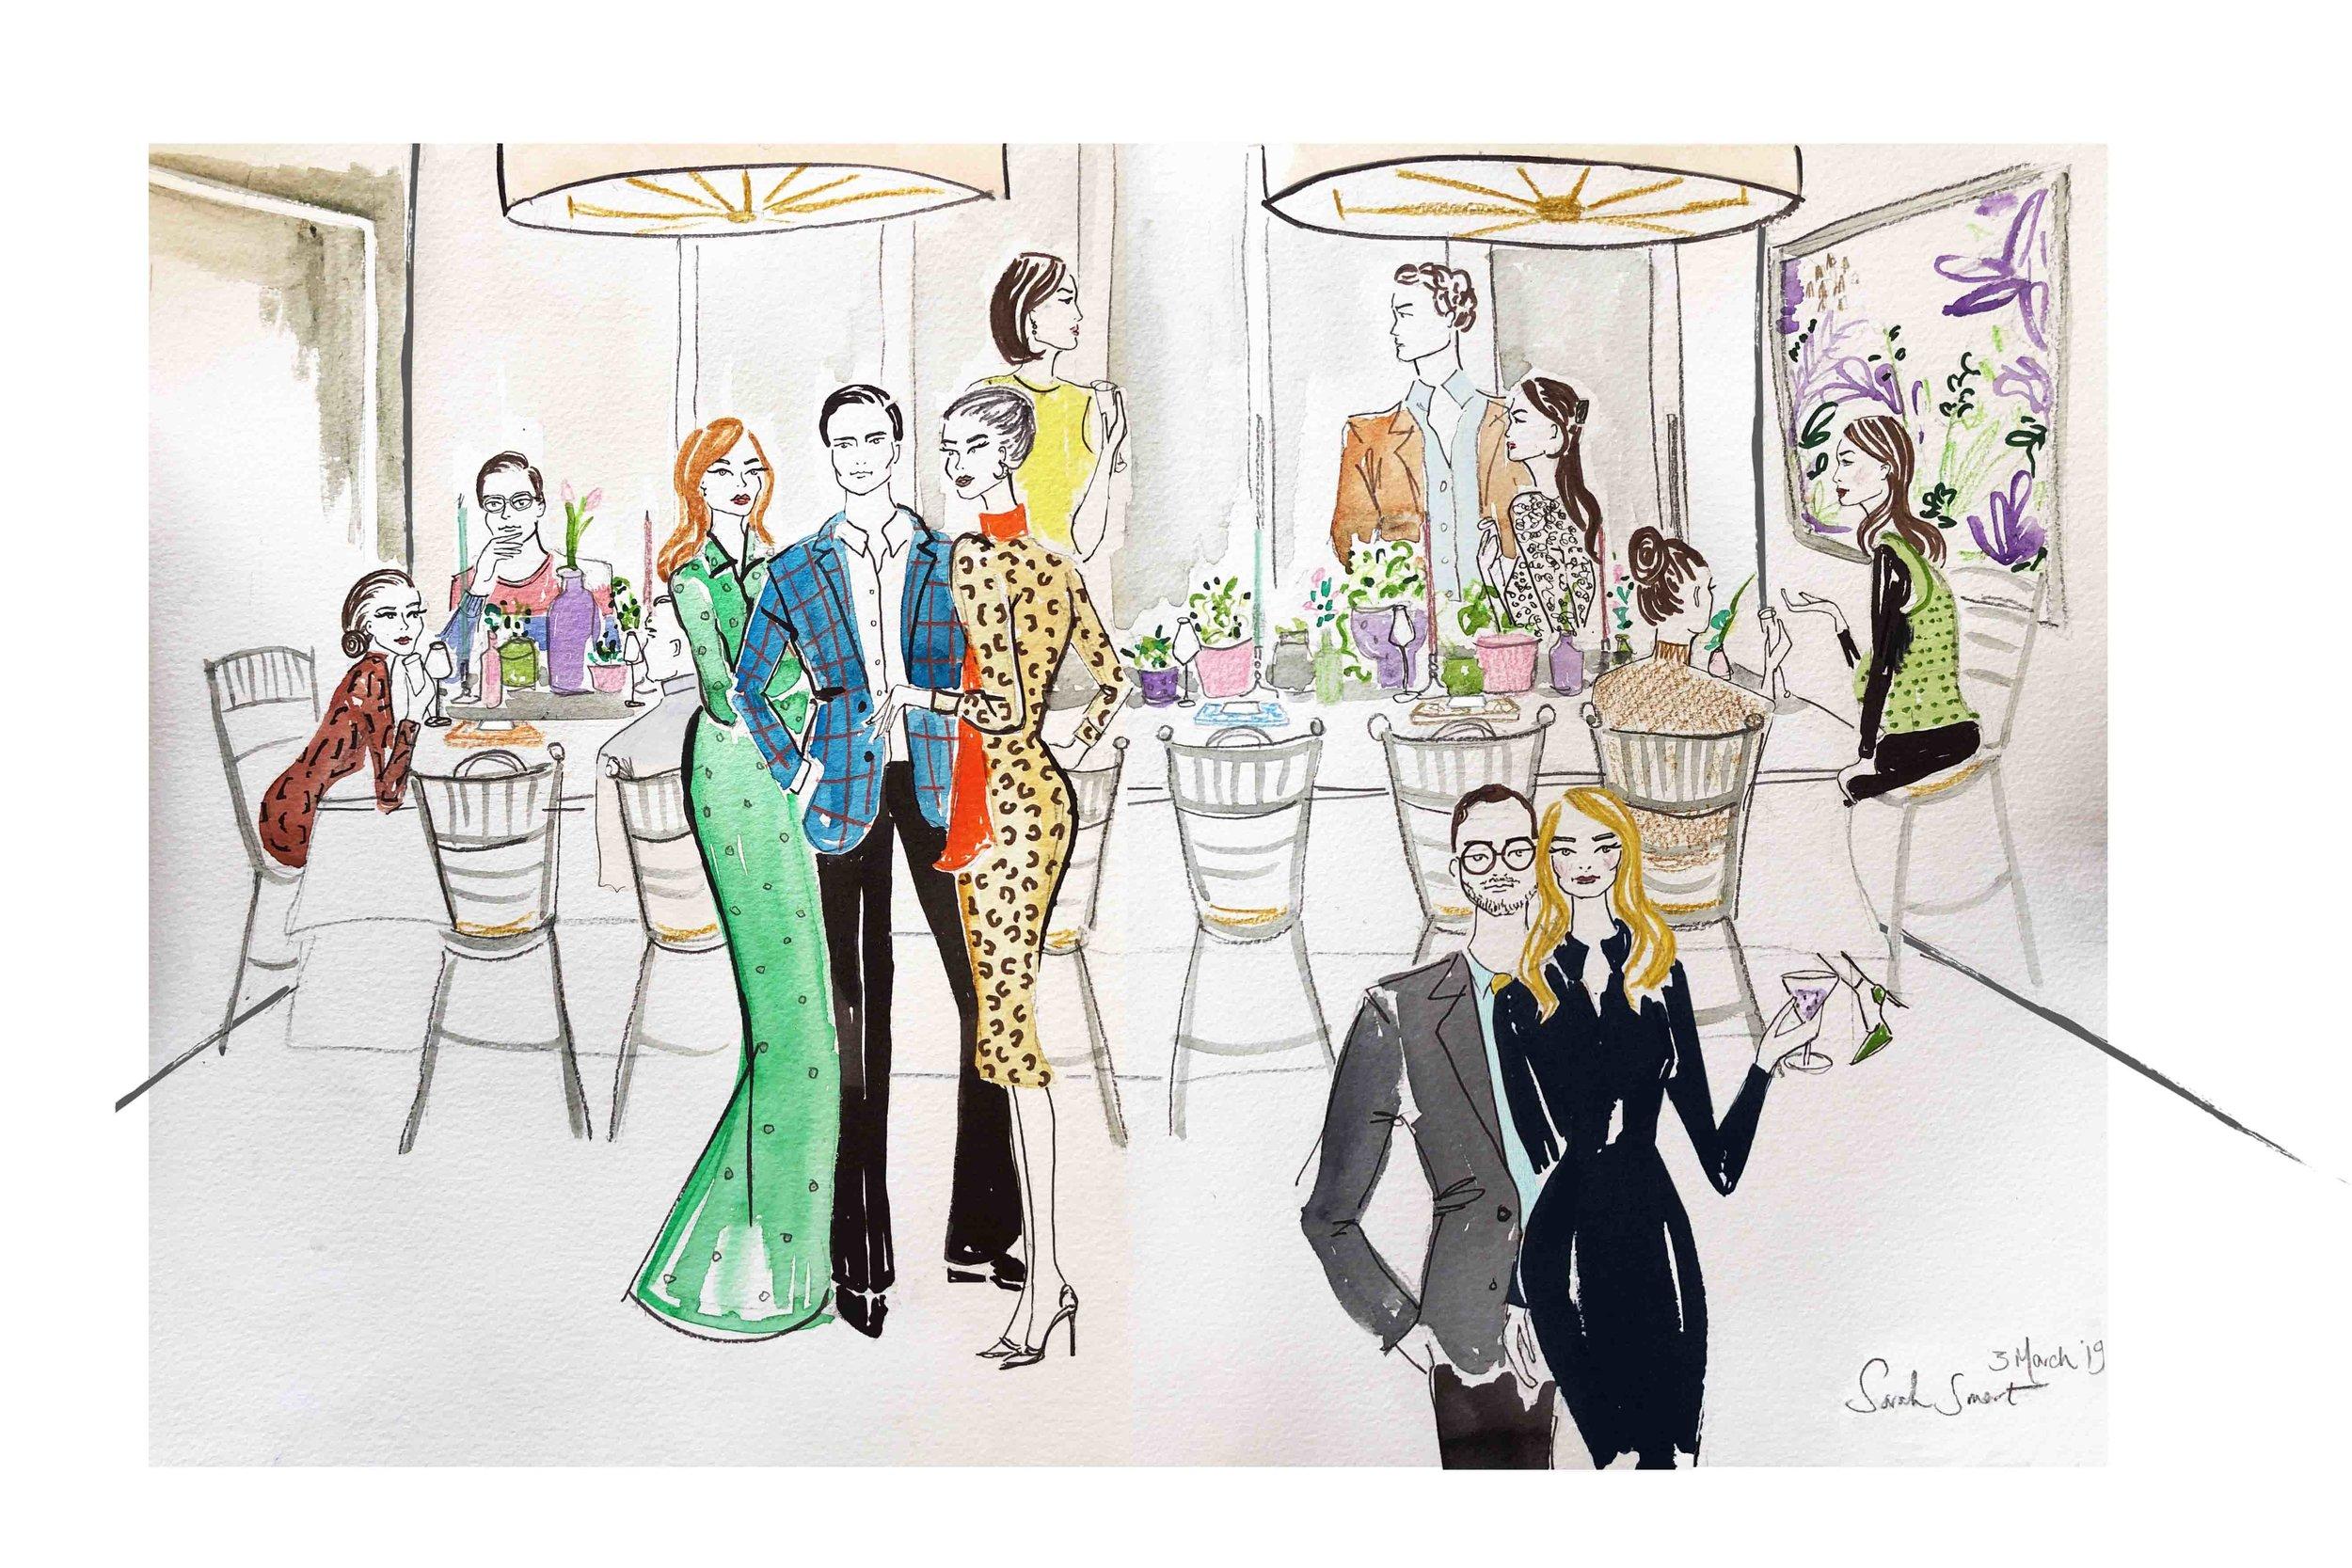 Live Fashion Illustration at The Belmond Cadogan, The final piece